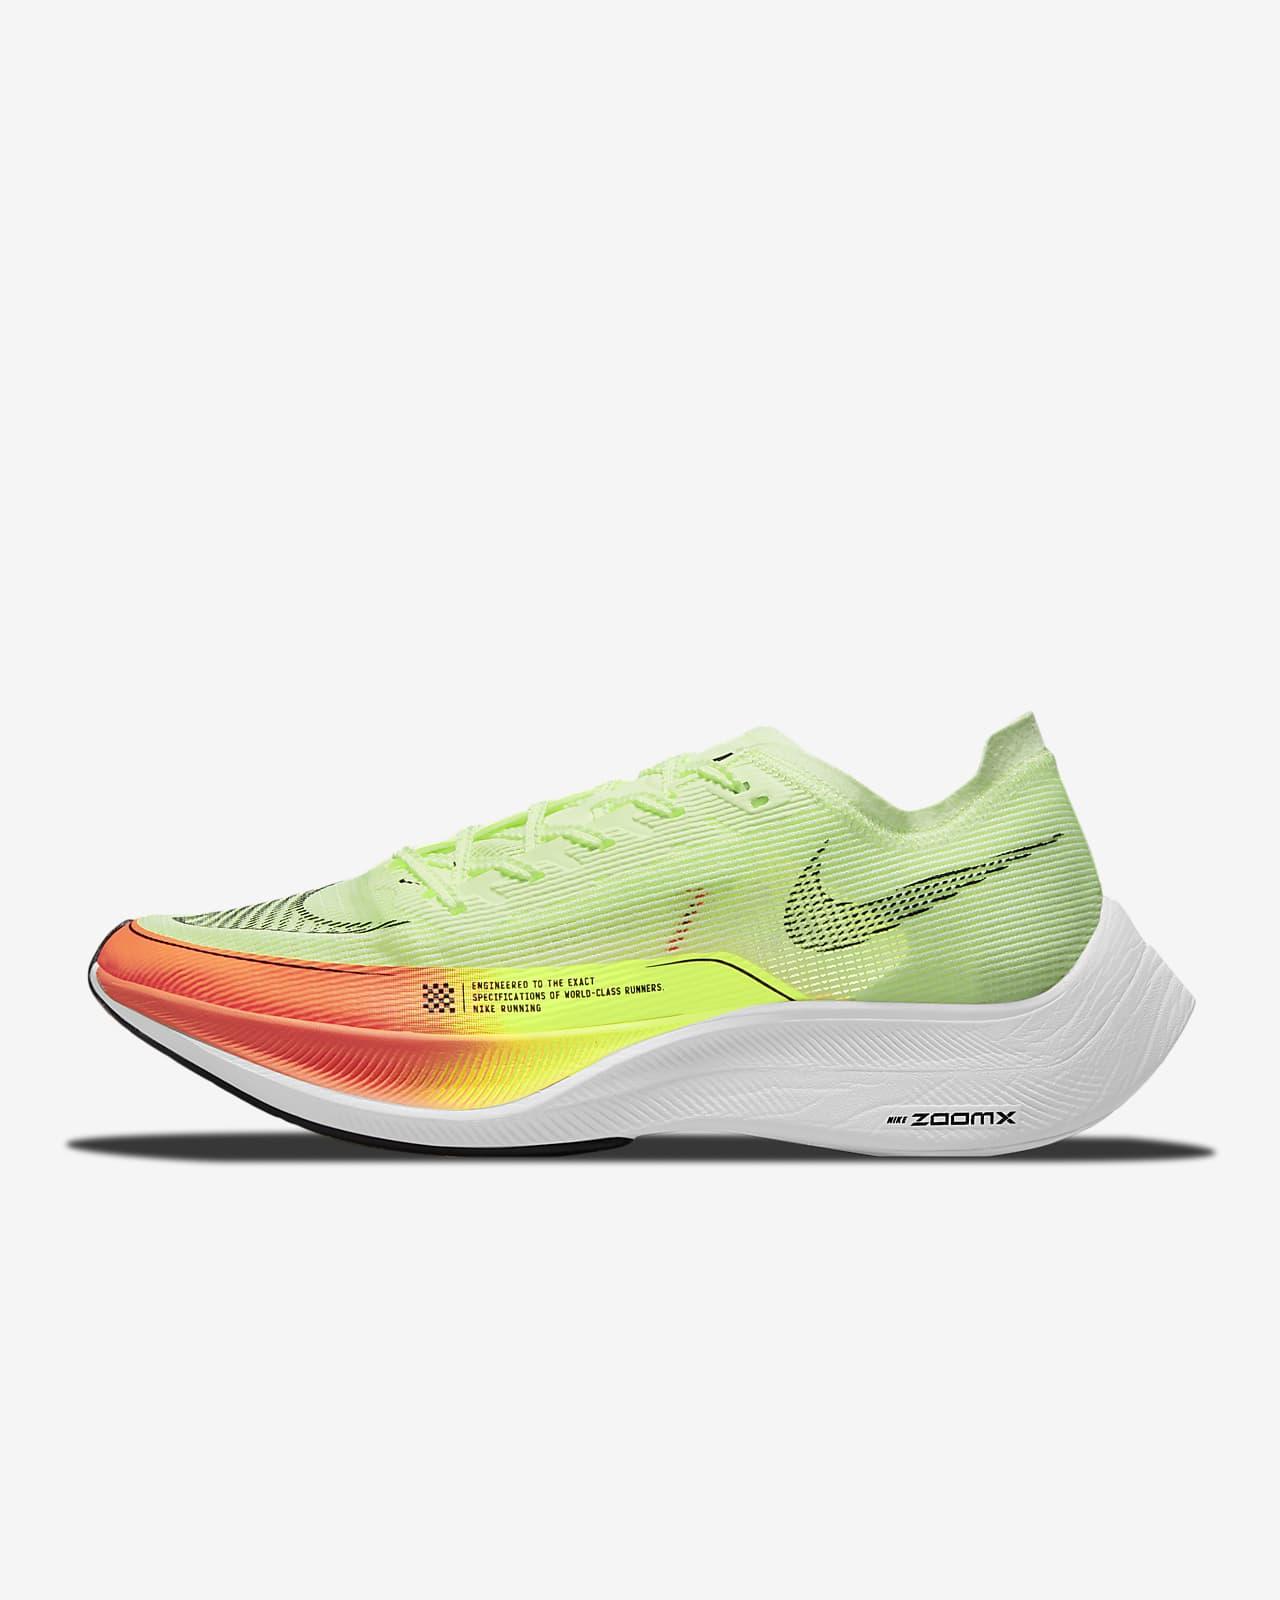 Scarpa da gara su strada Nike ZoomX Vaporfly Next% 2 - Uomo